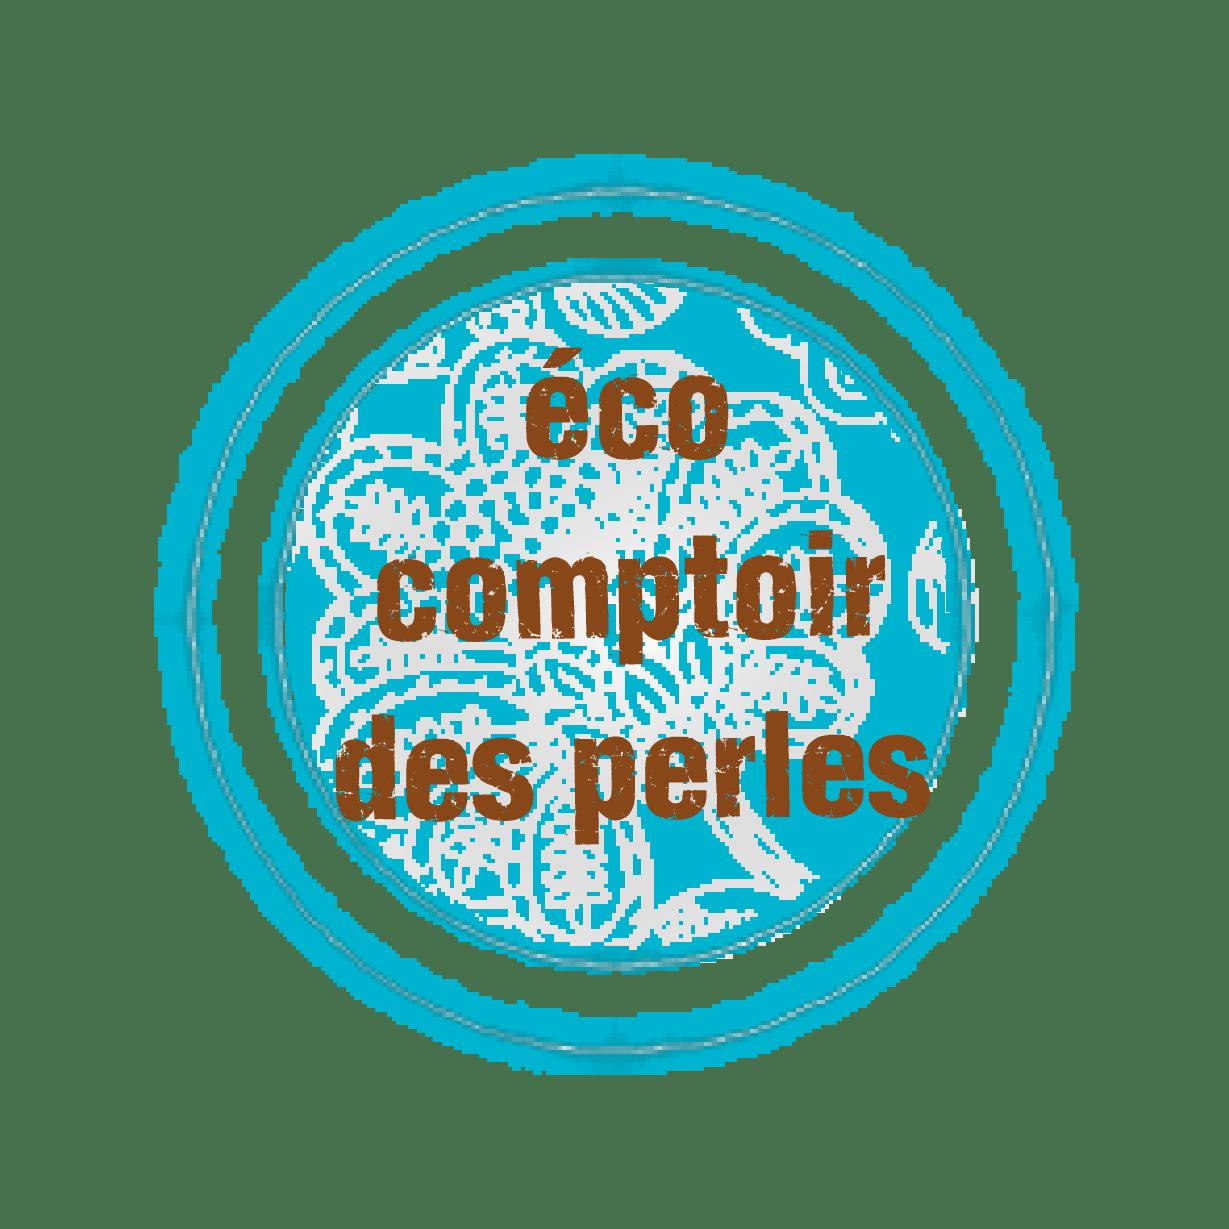 Eco comptoir des Perles